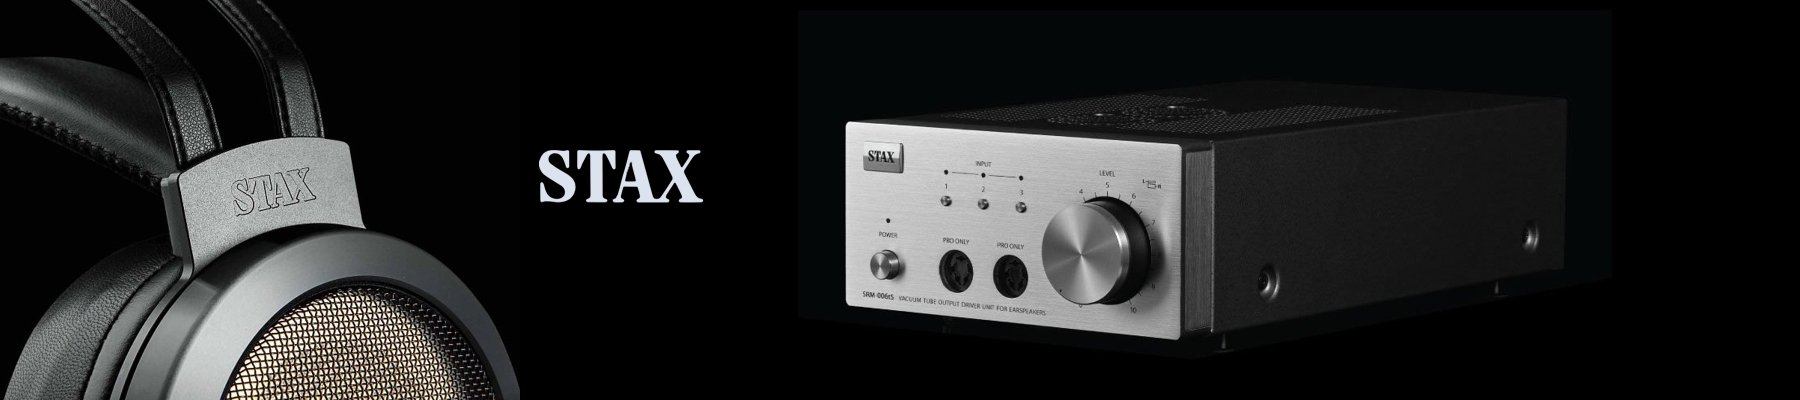 STAX Kopfhörer und Kopfhörerverstärker kaufen